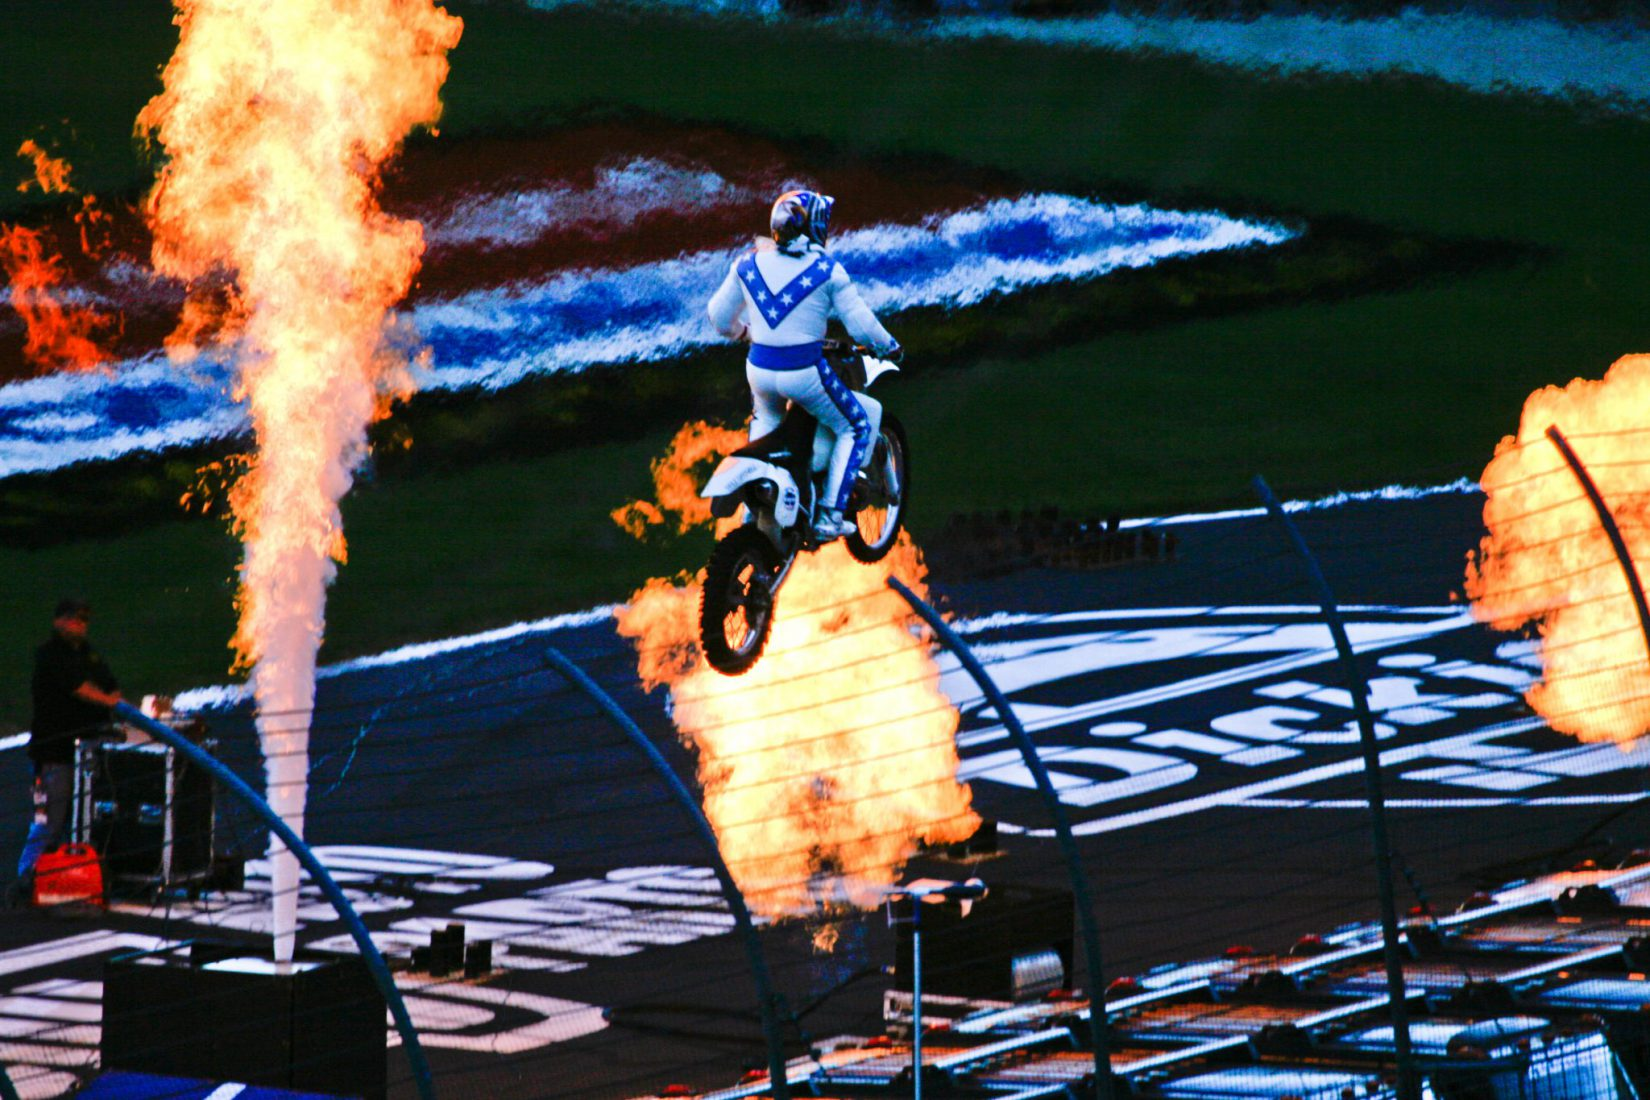 motociclista salto fuoco